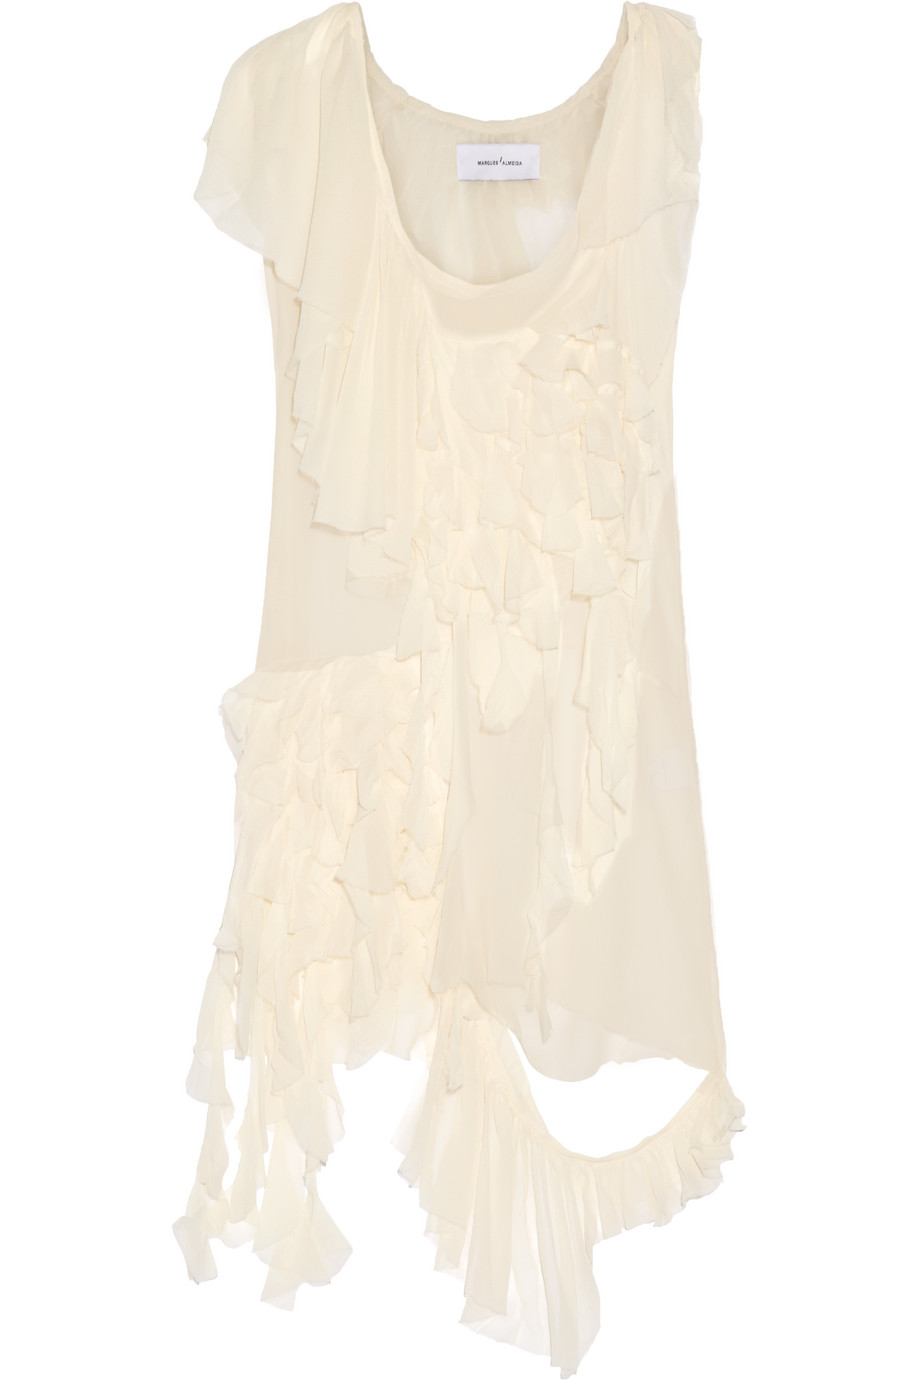 Ruffled Silk-Chiffon Dress, Marques' Almeida, Cream, Women's, Size: L